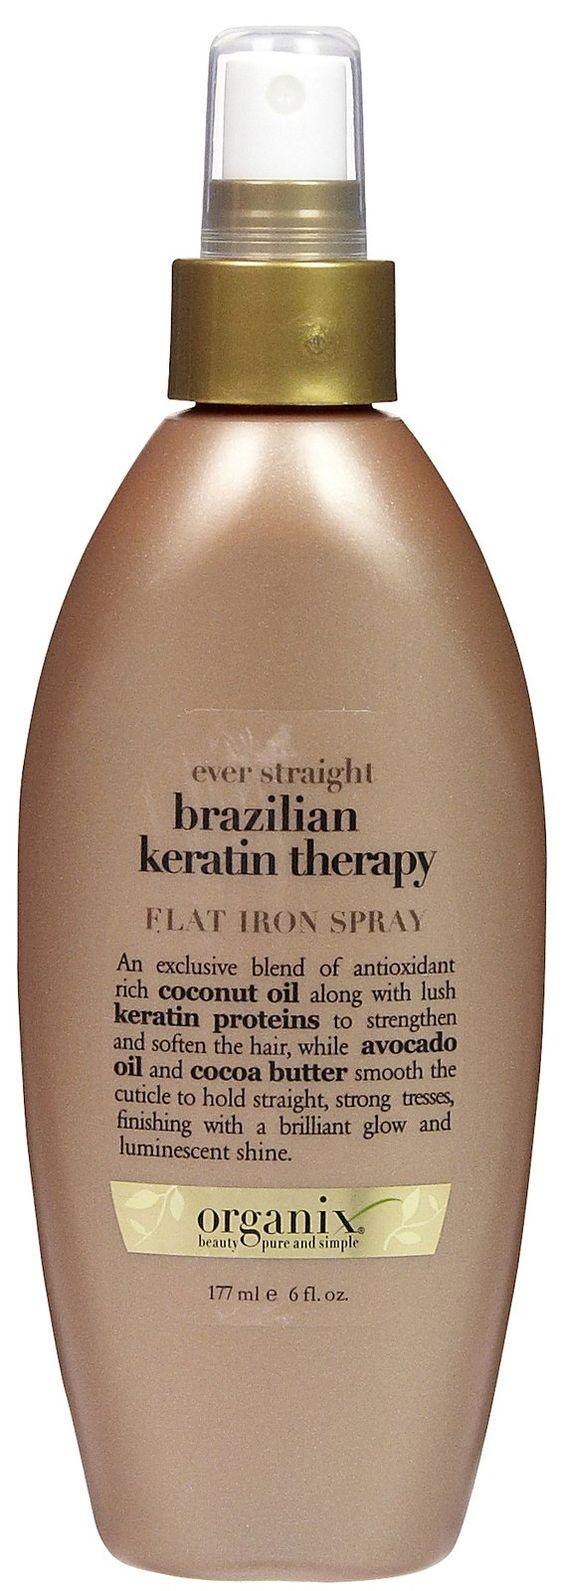 Brazilian keratin therapy flat iron spray review